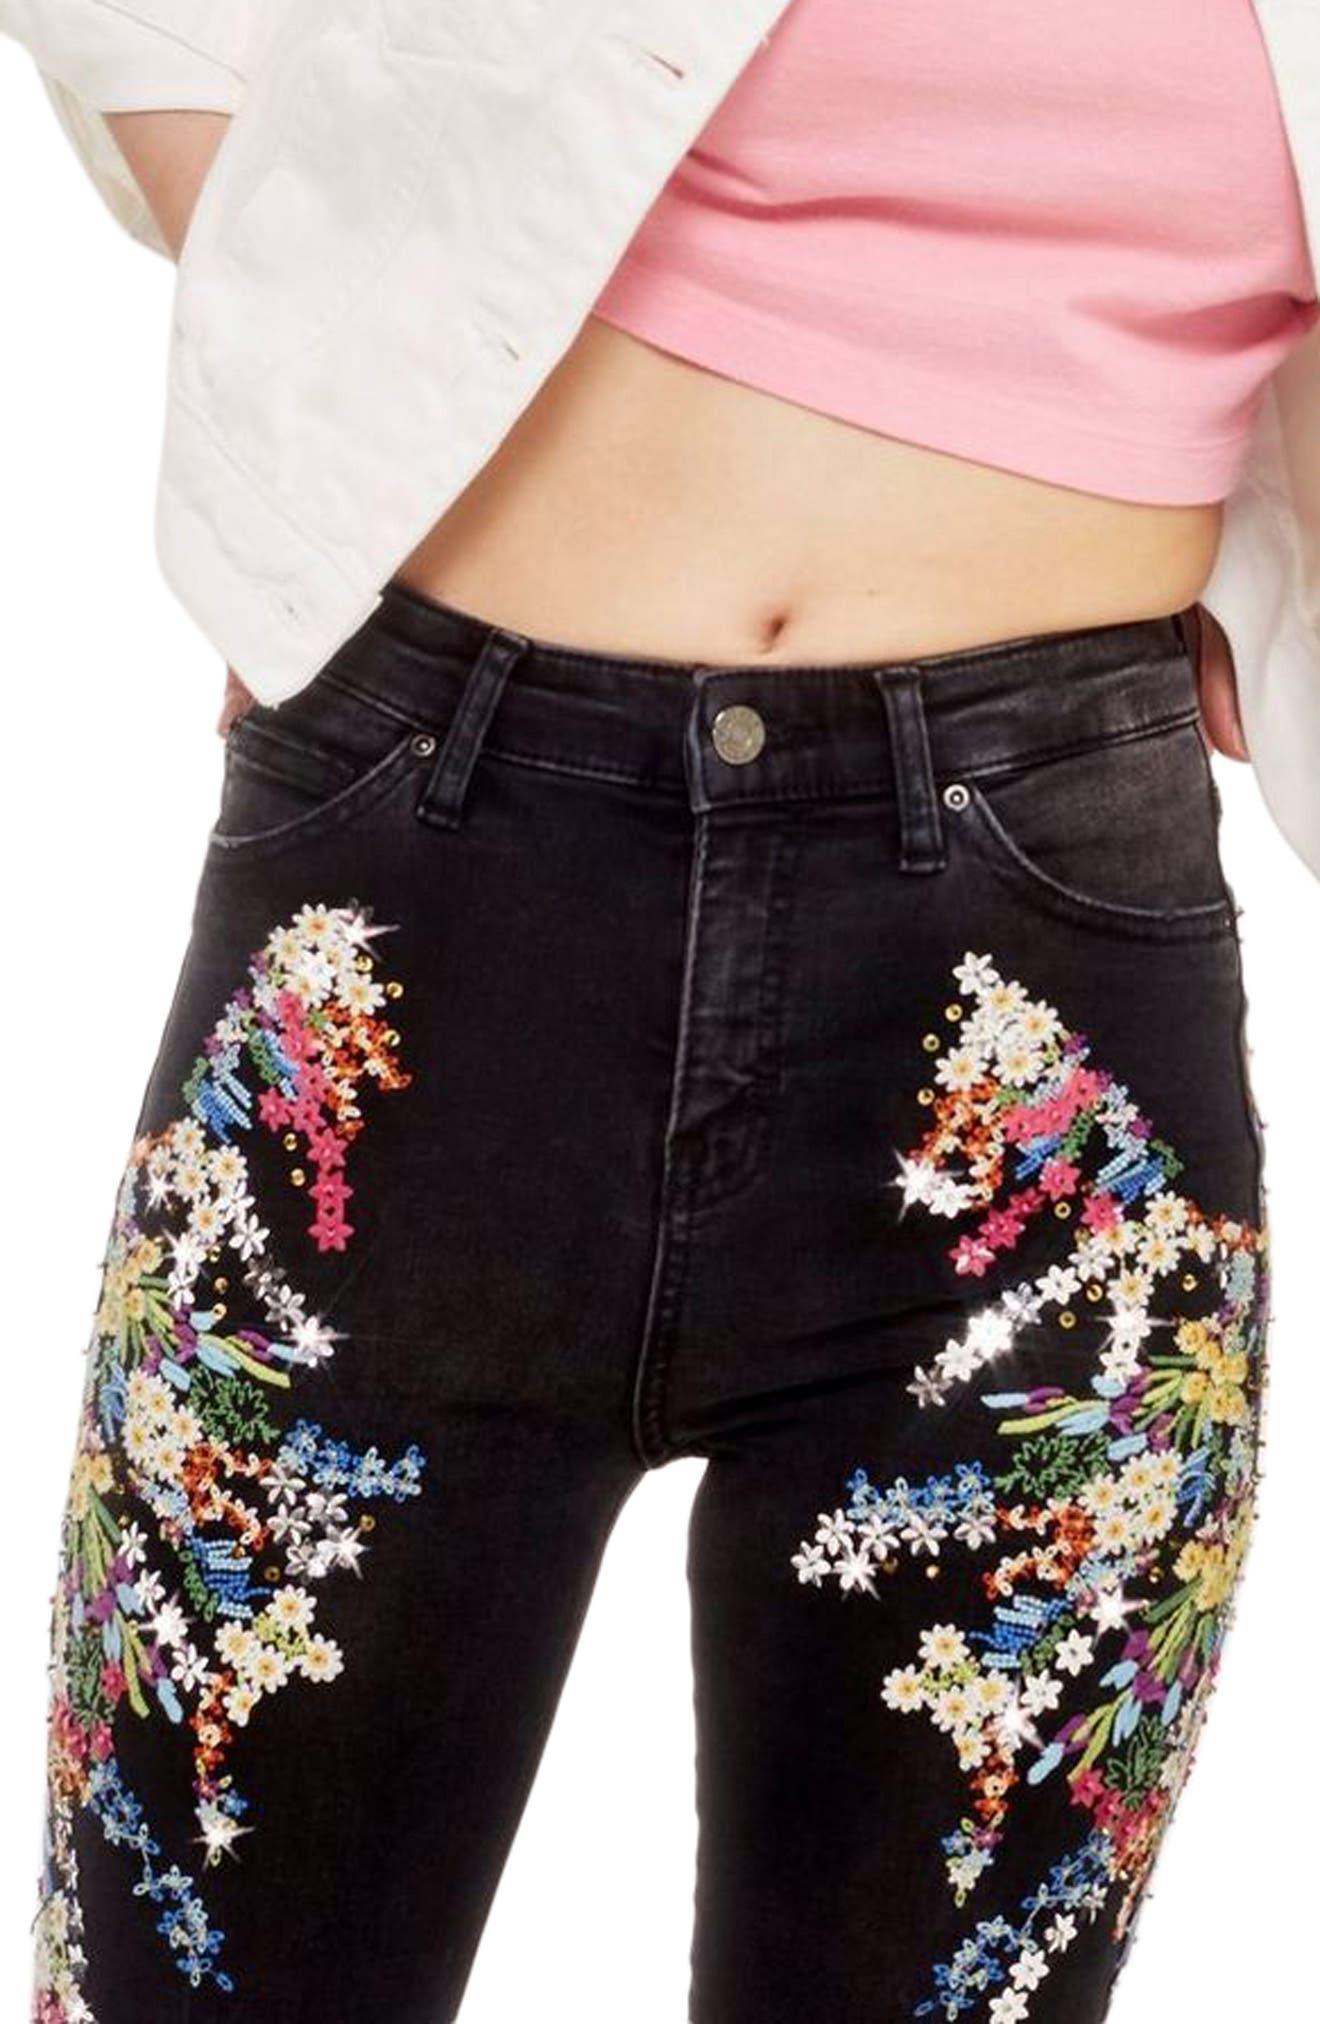 MOTO Jamie Ditsy Embellished Jeans,                             Alternate thumbnail 3, color,                             Black Multi